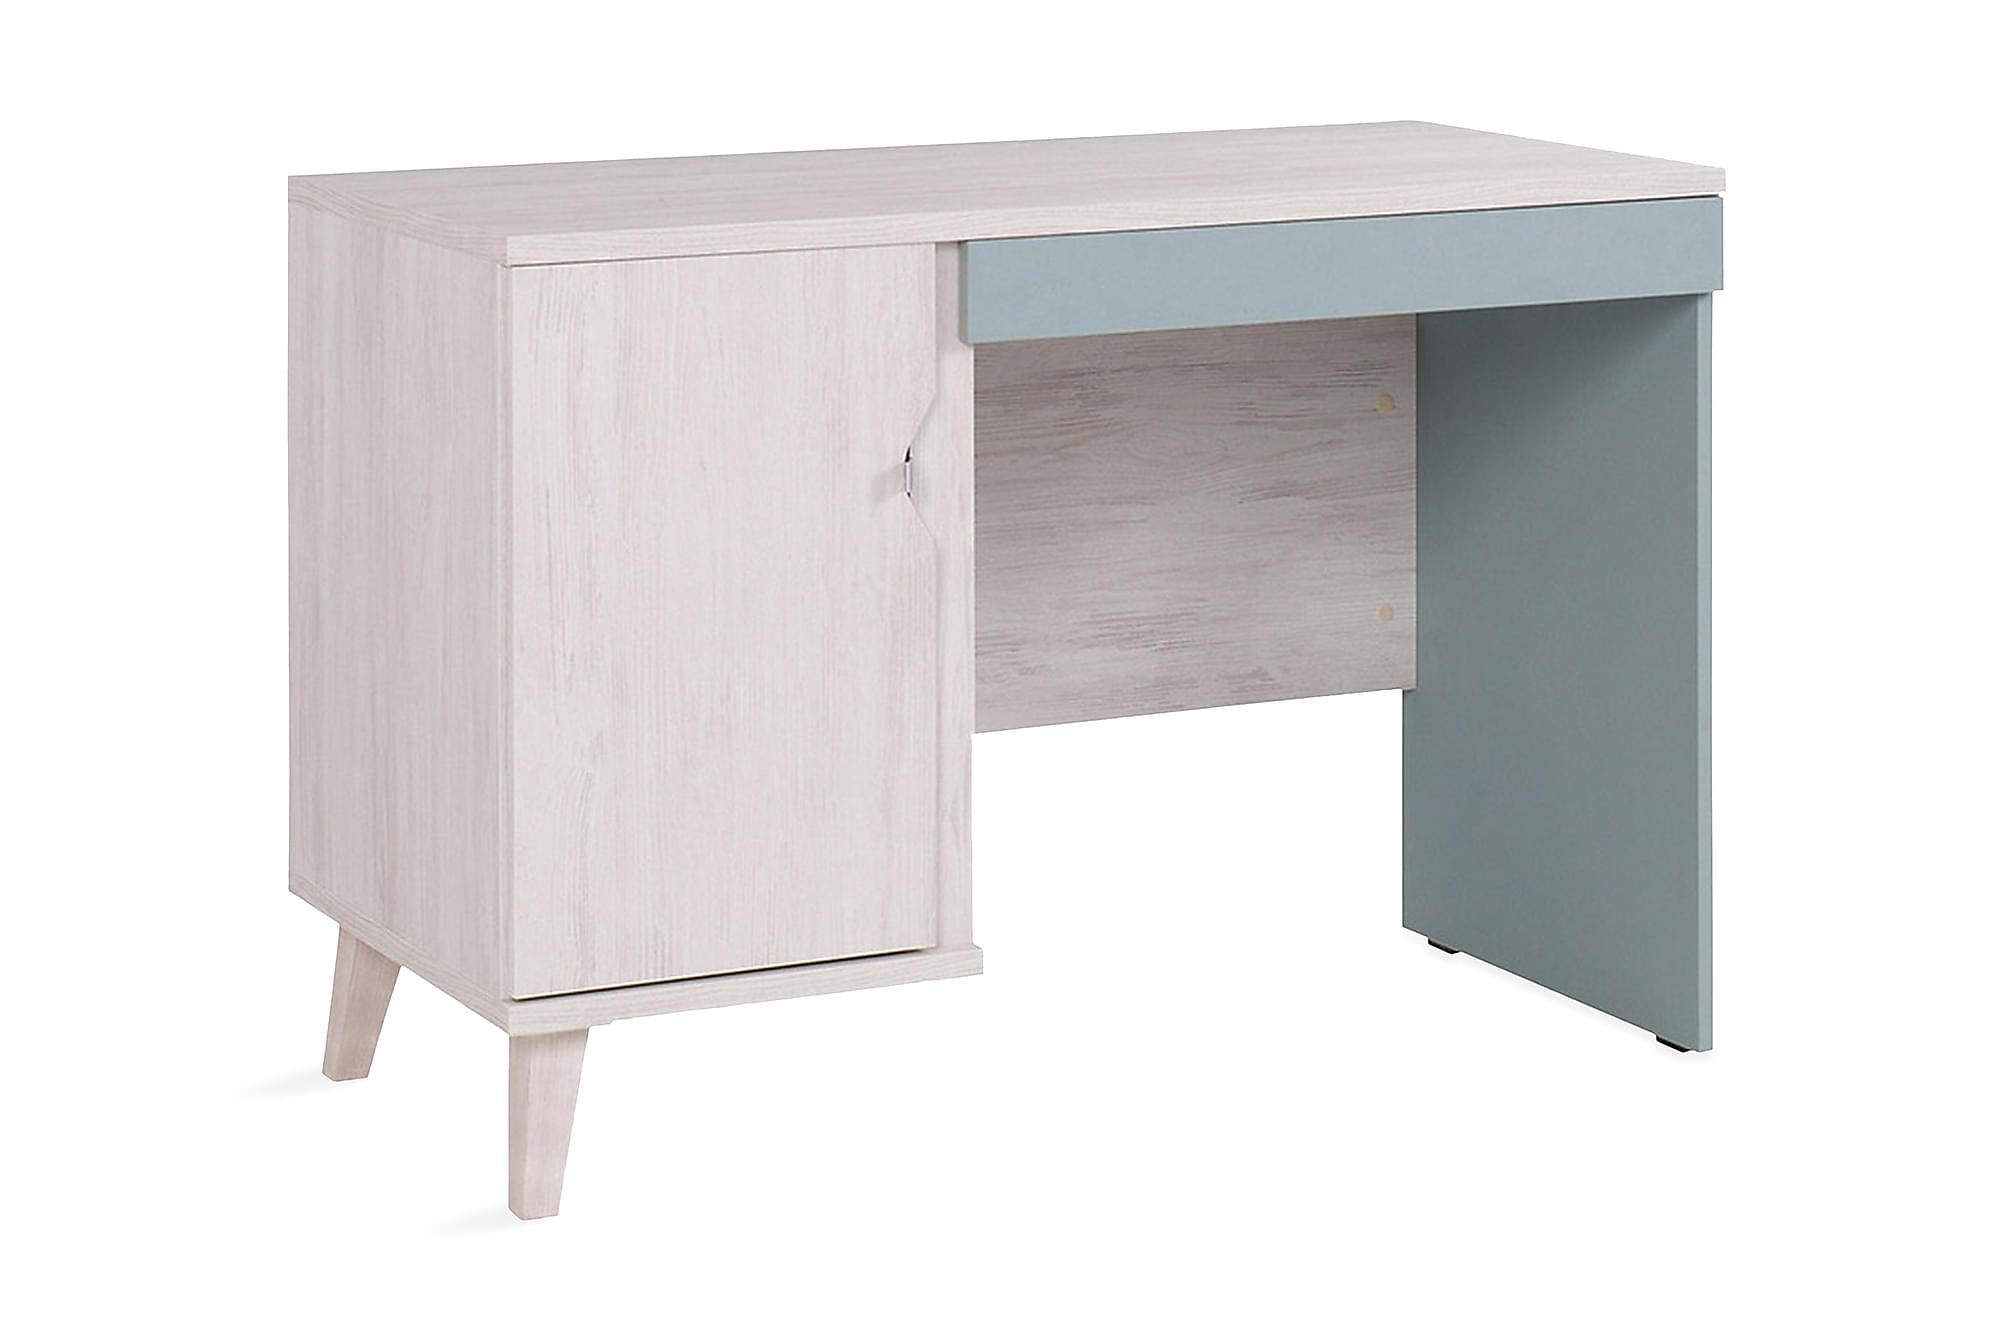 Norrhace skrivbord vit/blå